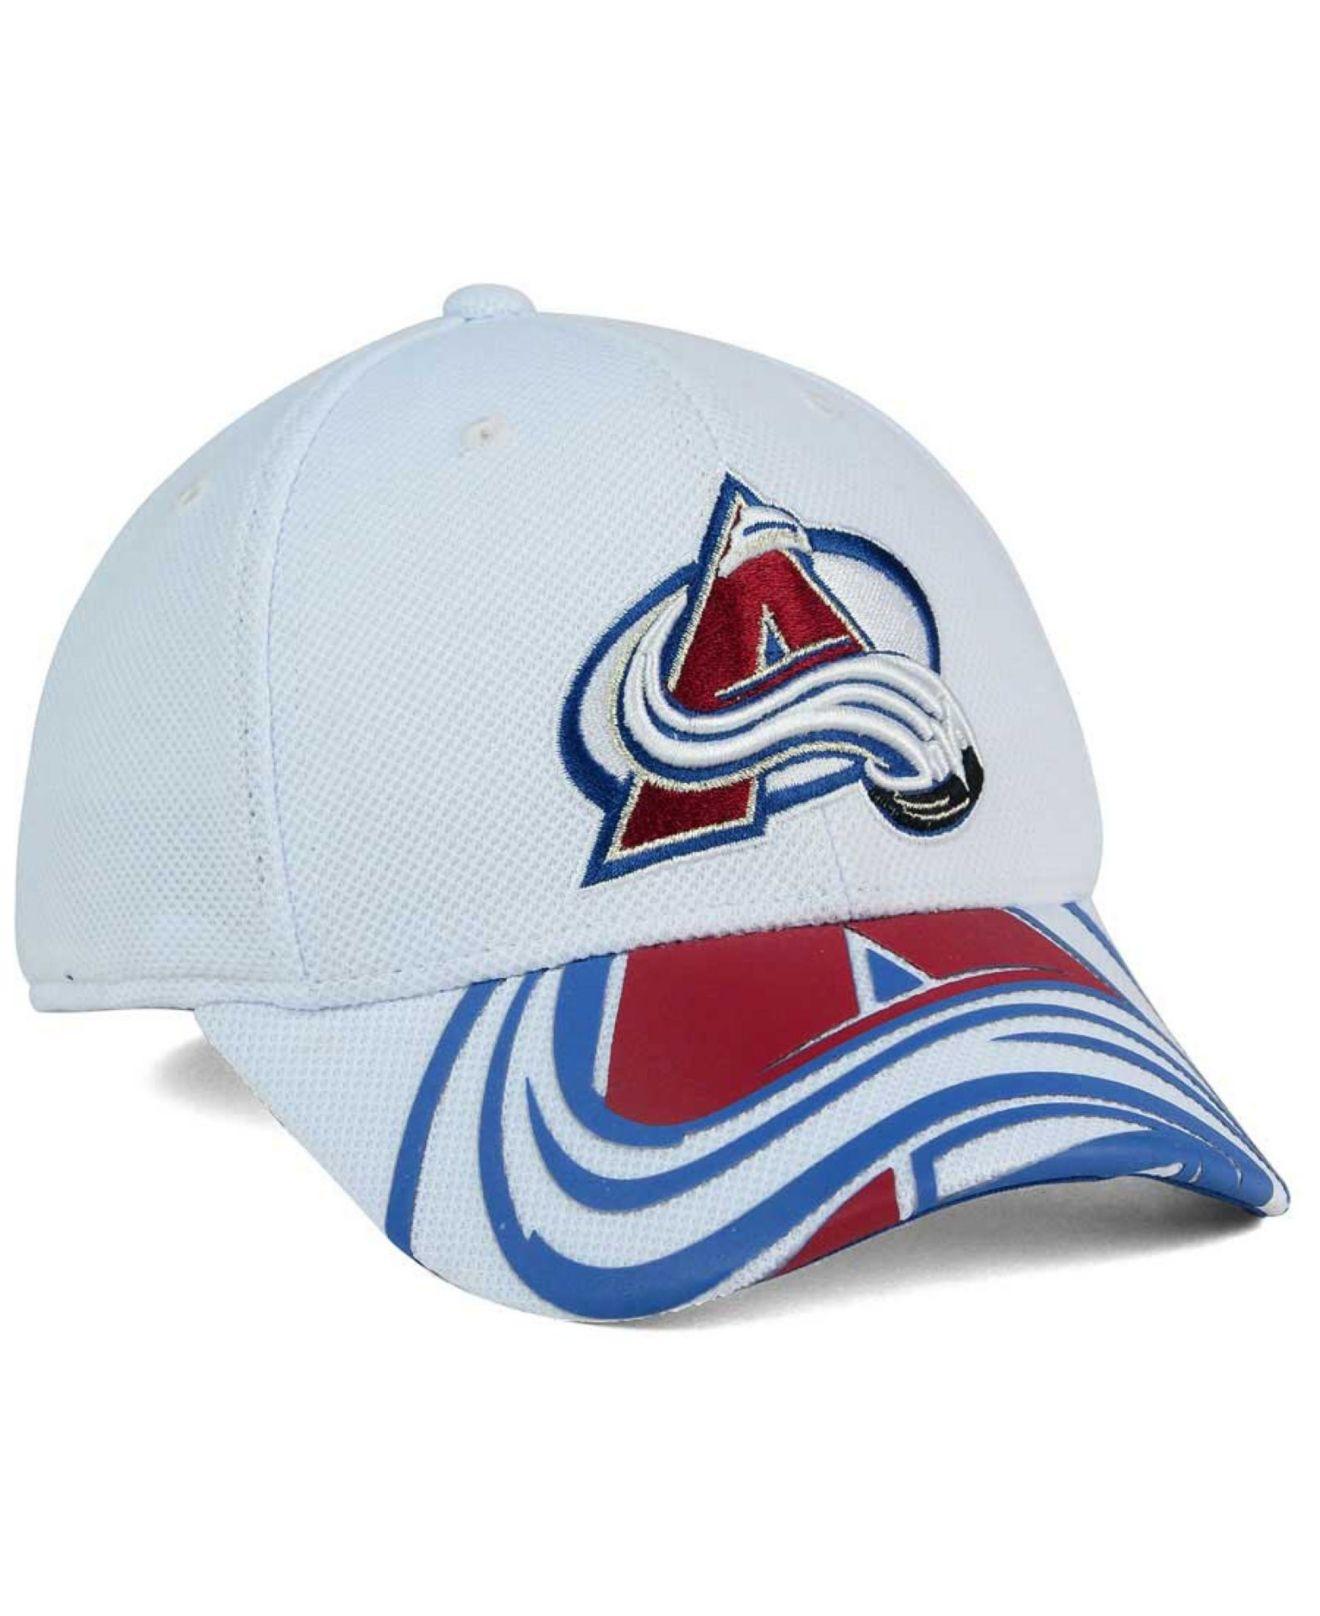 competitive price 1dfc3 98438 ... structured flex hat a268d c17e7  purchase lyst reebok colorado  avalanche 2nd season draft flex cap in blue bec89 2456b